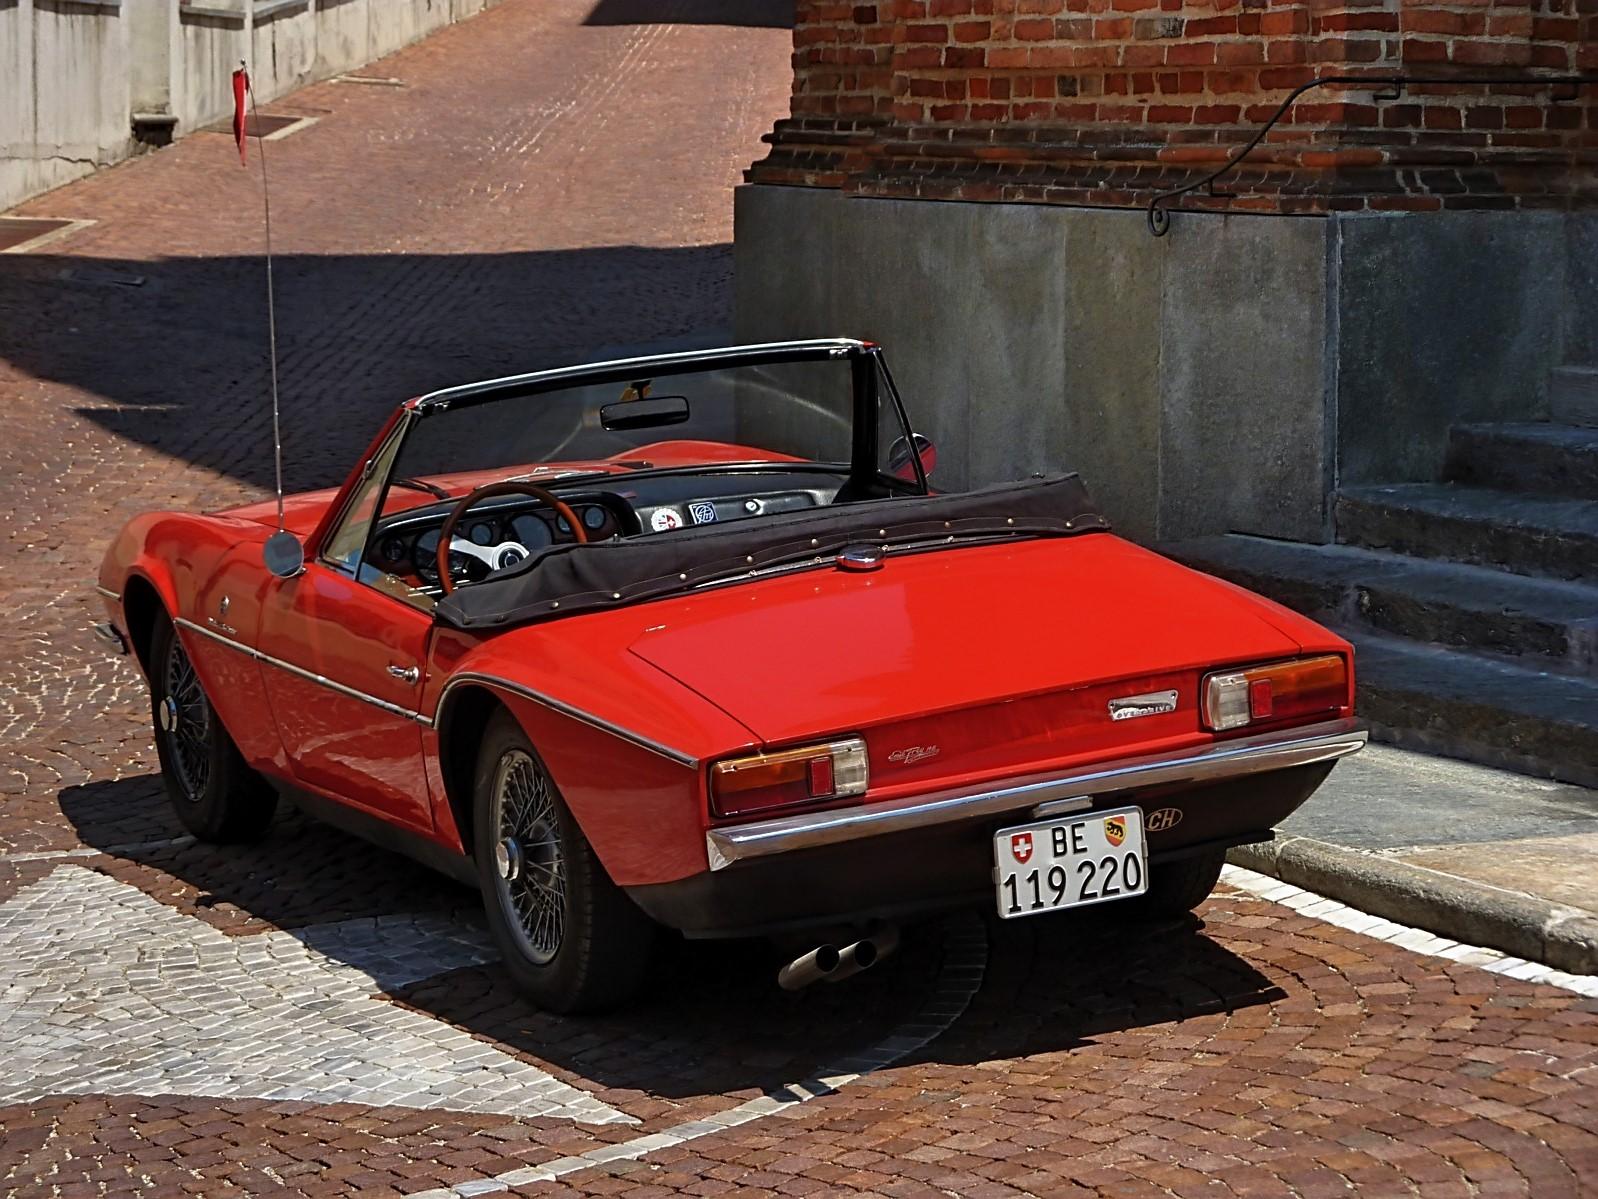 1968 Michelotti TR5 Ginevra Prototype (54)